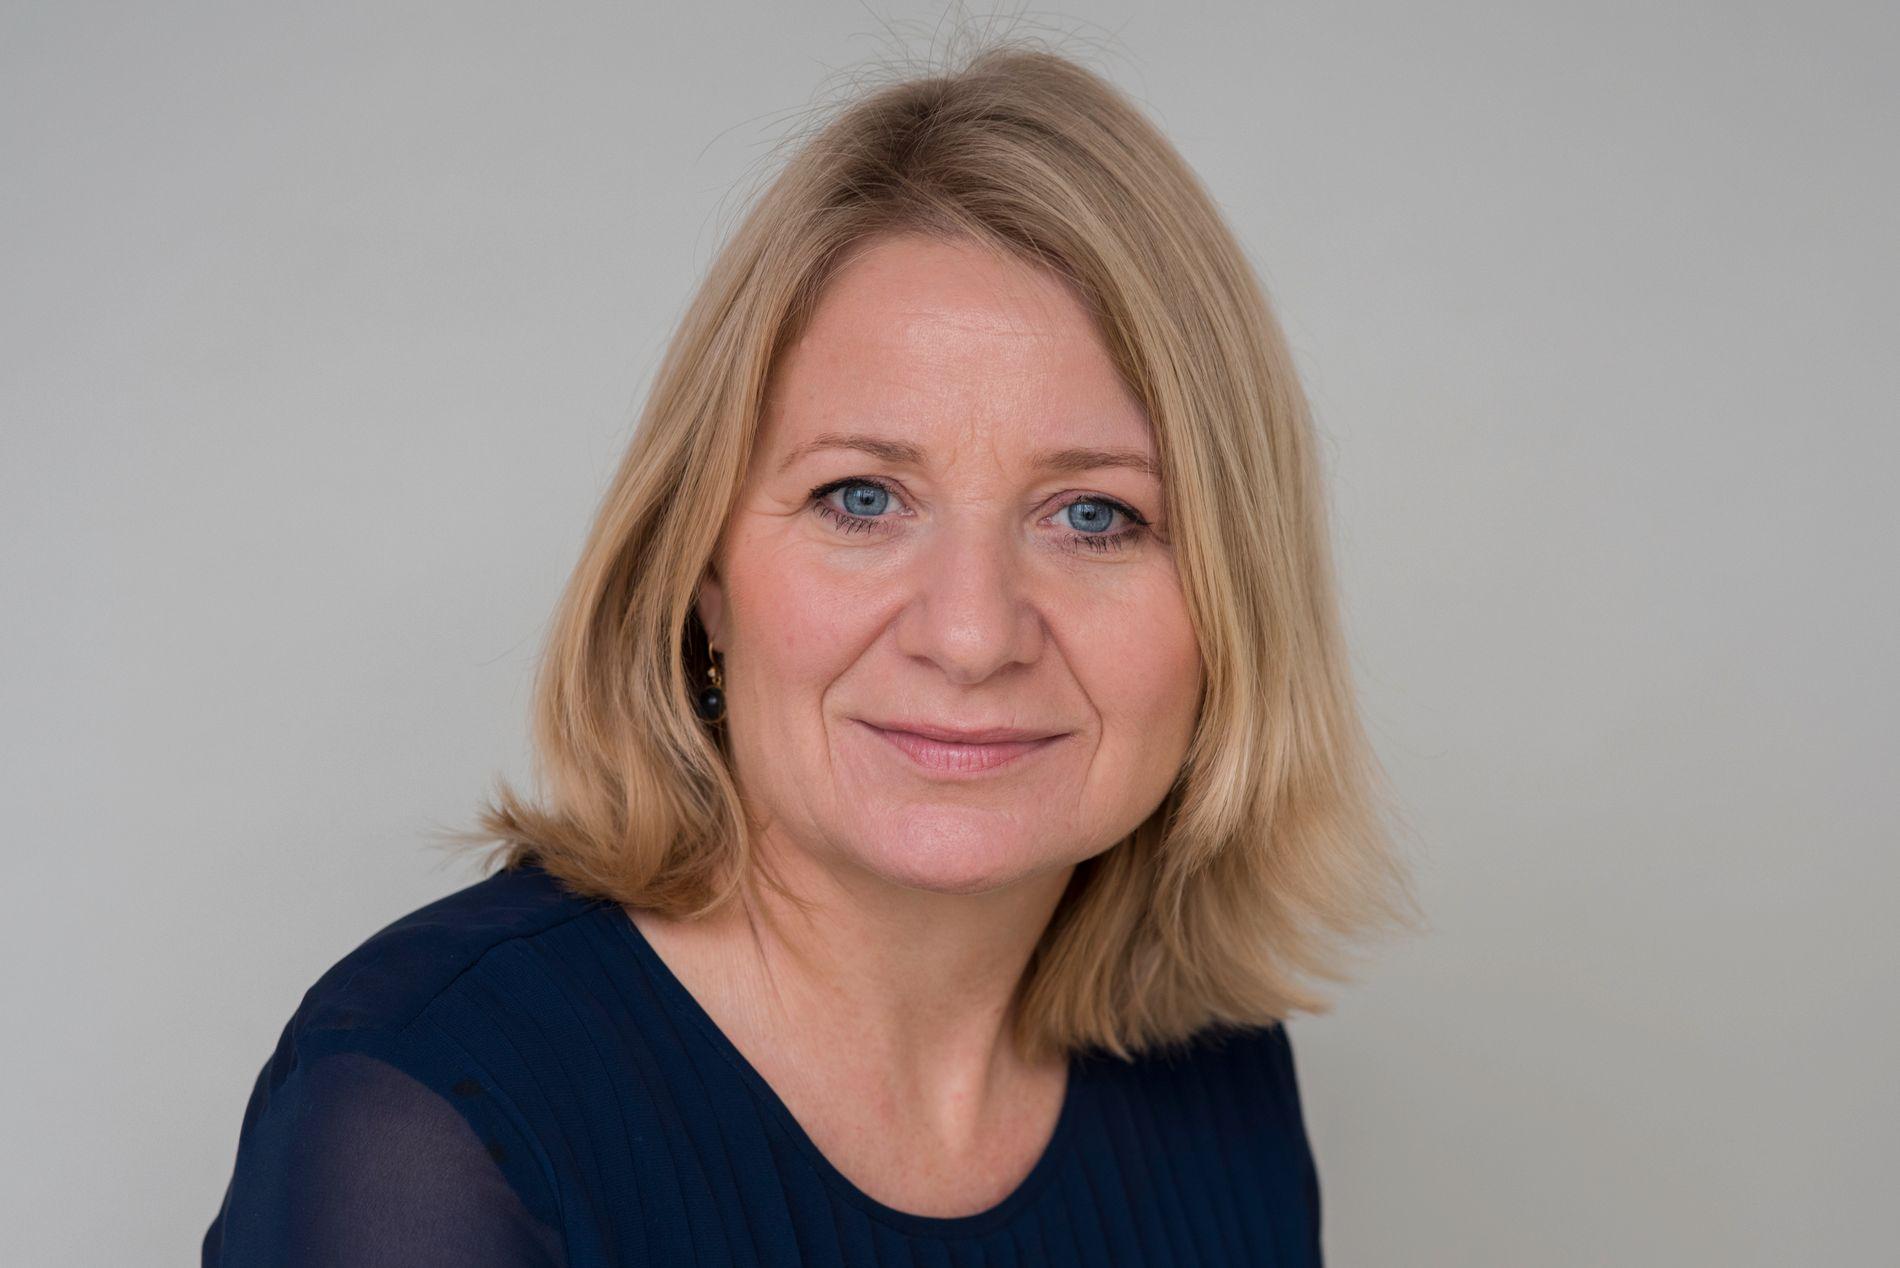 Fungerende avdelingsdirektør i UDIs region- og mottaksavdeling, Borghild Fløtre.